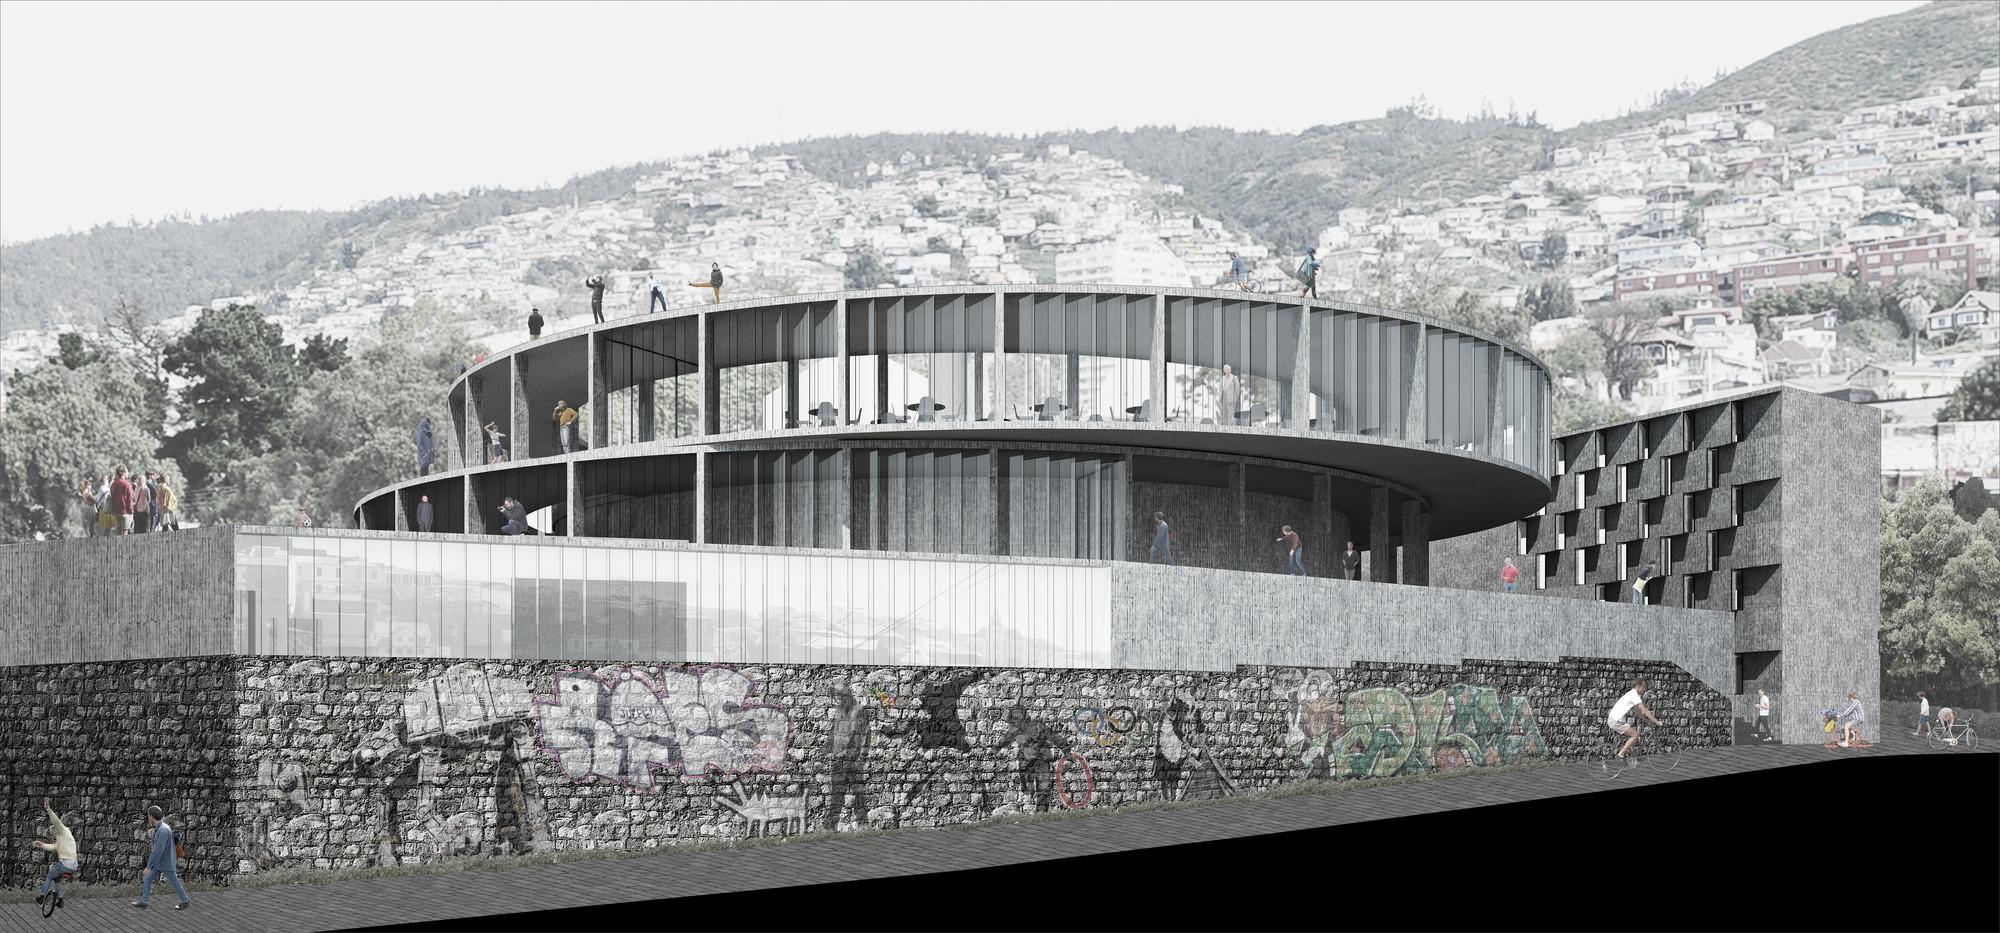 Courtesy of Tidy + Cáceres + Lazo Arquitectos